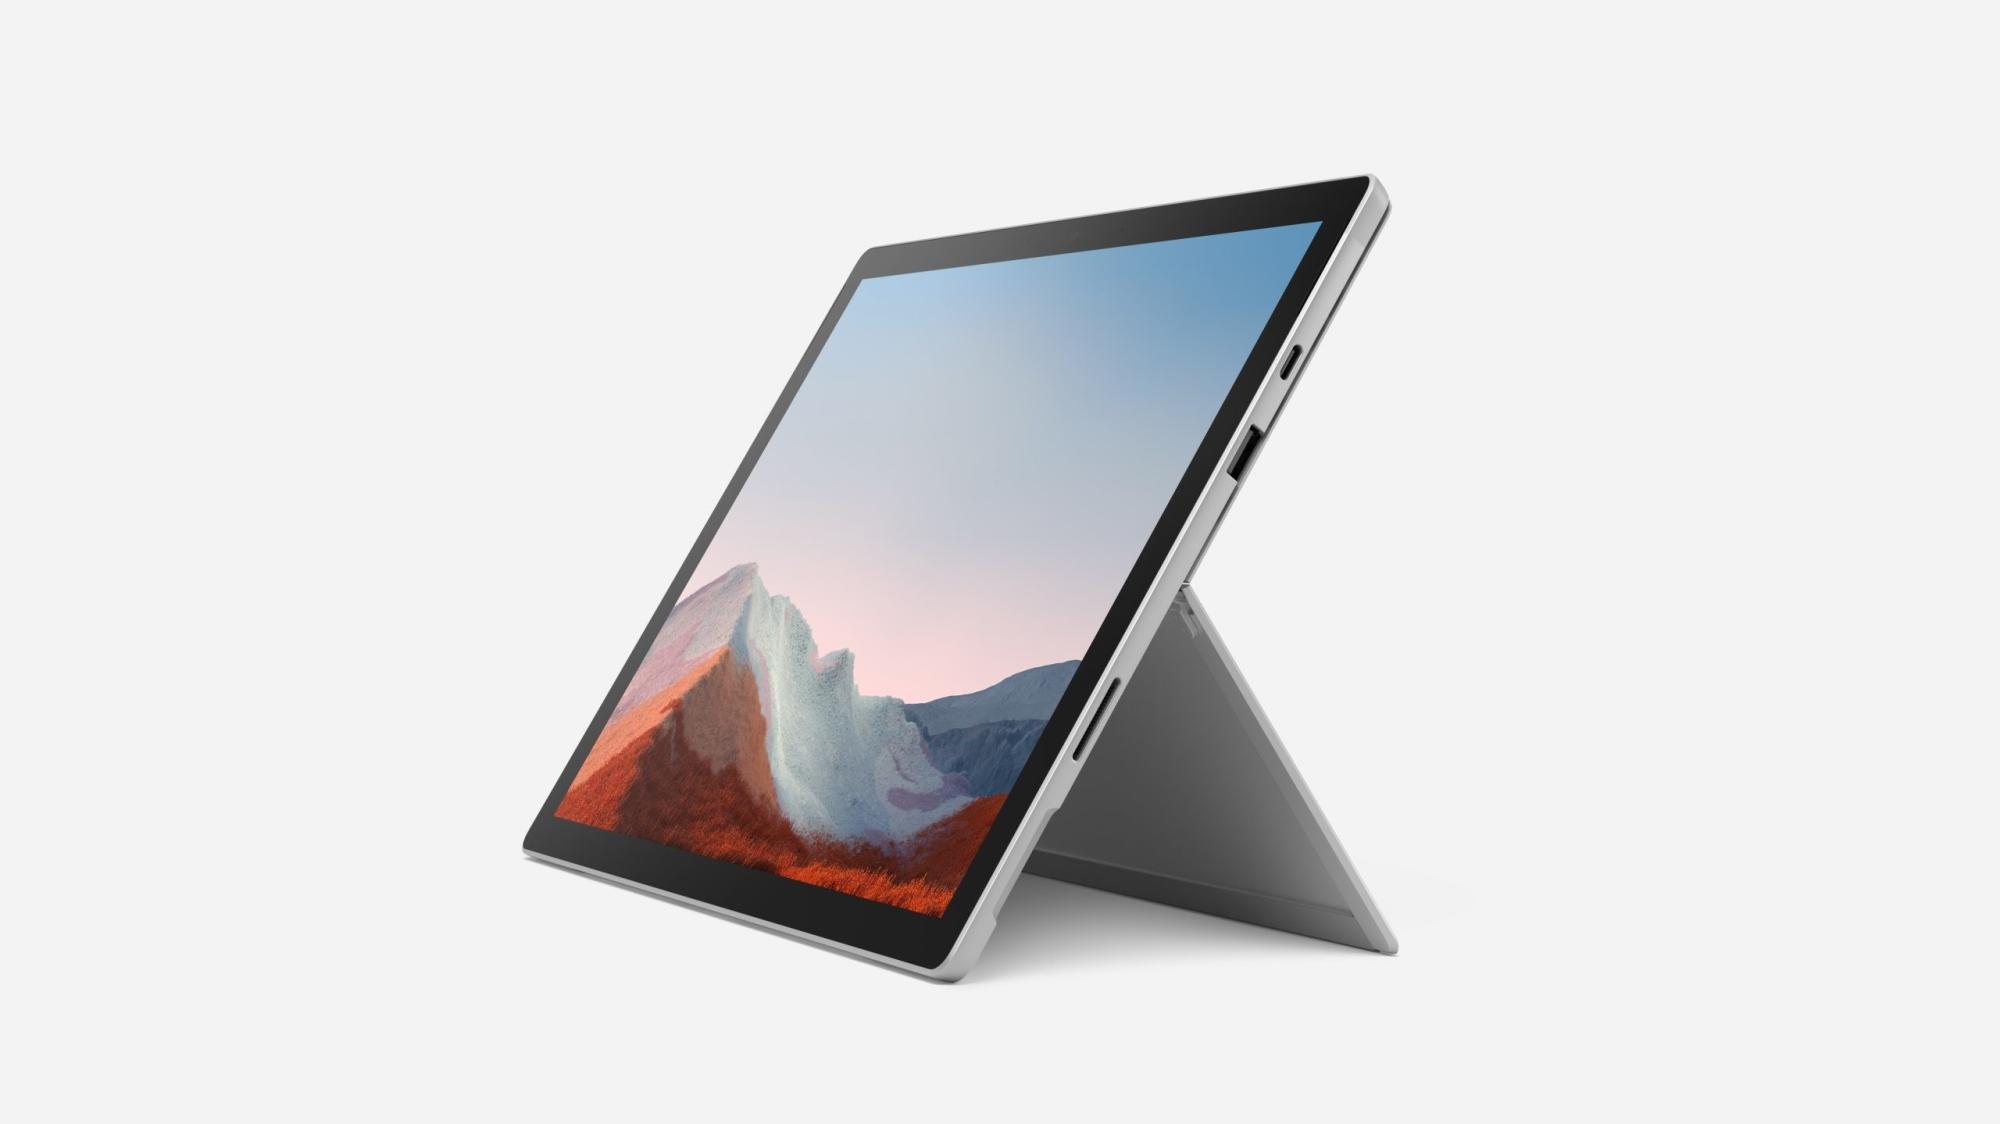 Surface Pro 7+ 256 Gb 31,2 Cm (12.3) Intel Core I5-11xxx 8 Gb Wi-fi 6 (802.11ax) Windows 10 Pro Platino